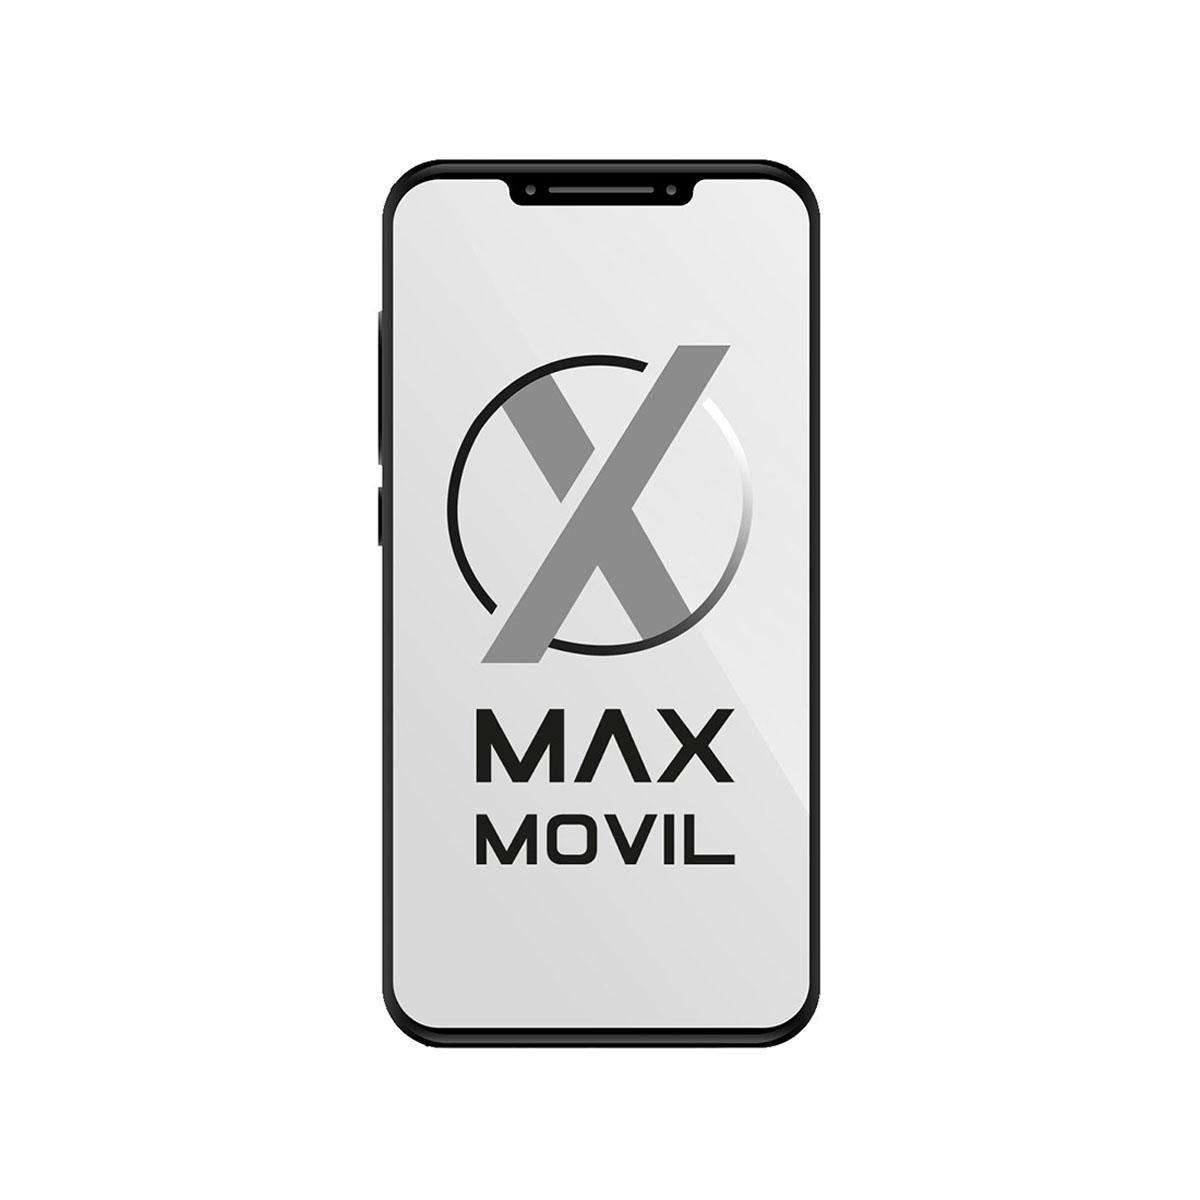 ff342fb88075 Reloj Casio ABX-600-7AV LIQUIDACION Comprar Online Barato · MaxMovil ...